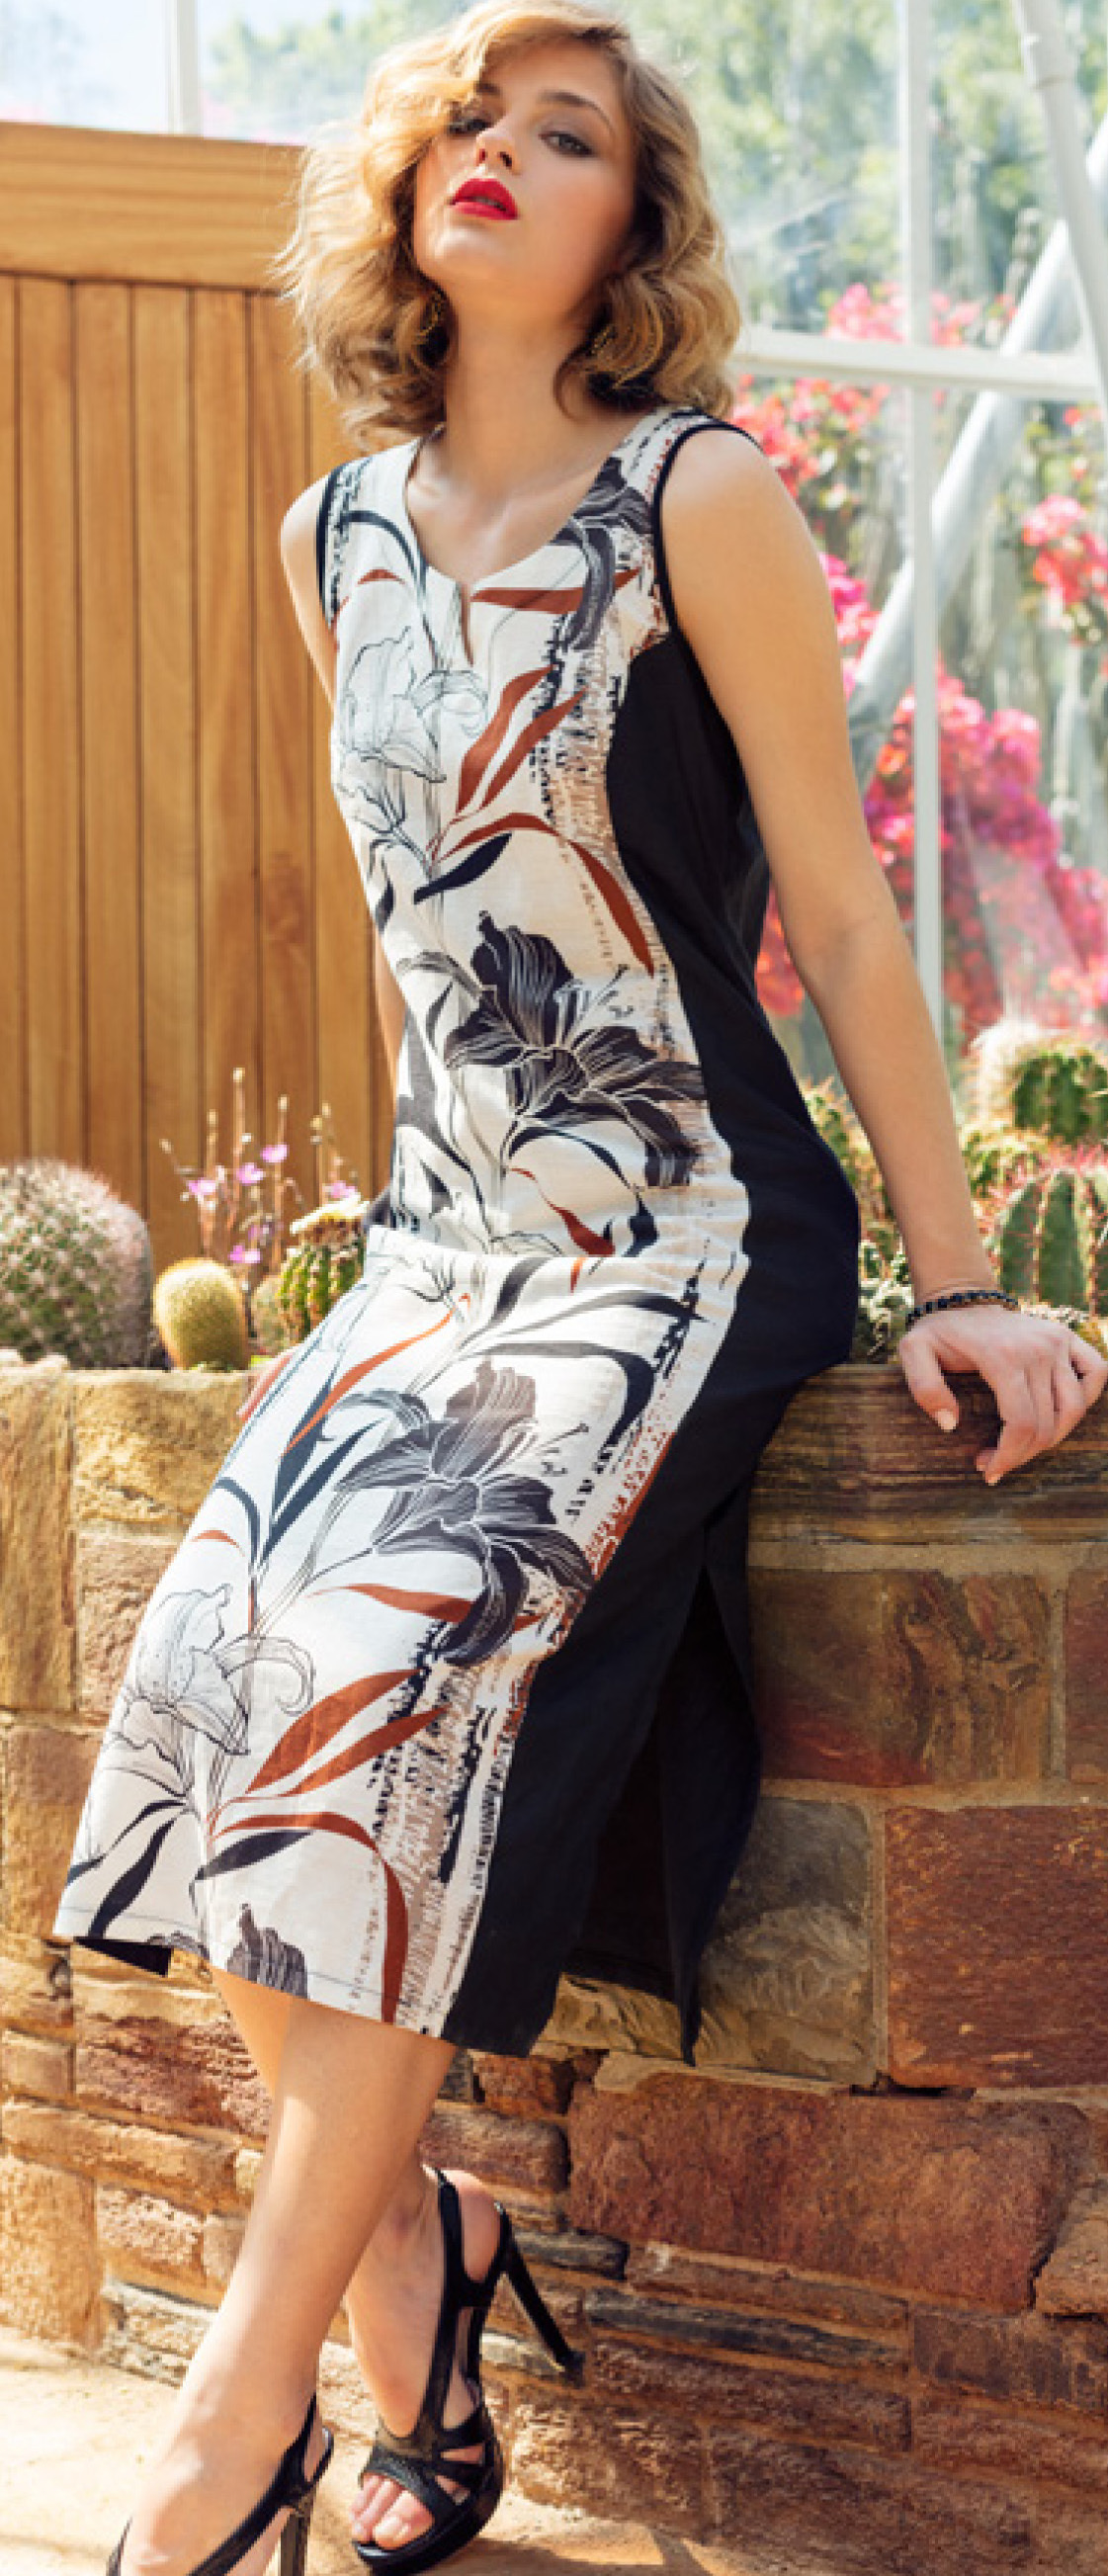 Maloka: Black Lily Sketch Art Colorblock Linen Maxi Dress (1 Left!) MK_YELDA_N3